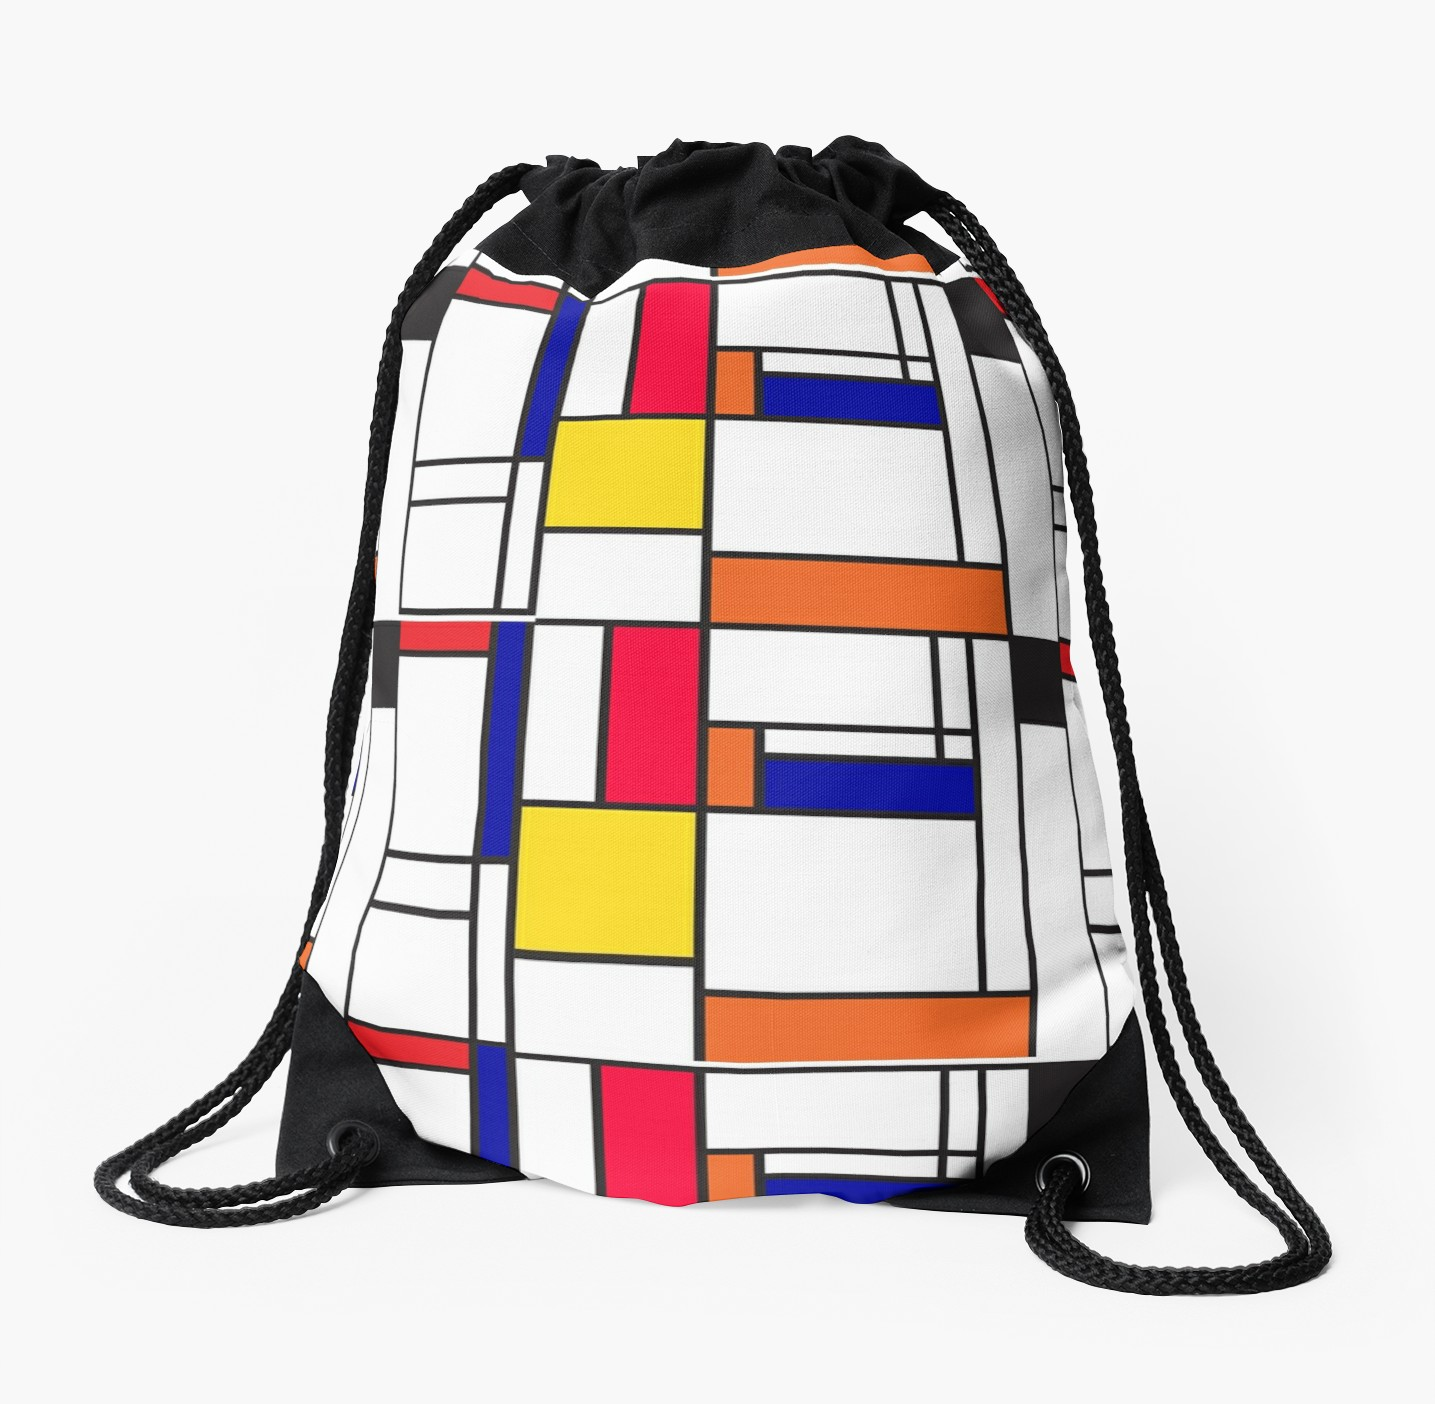 Mondrian inspired drawstring bag